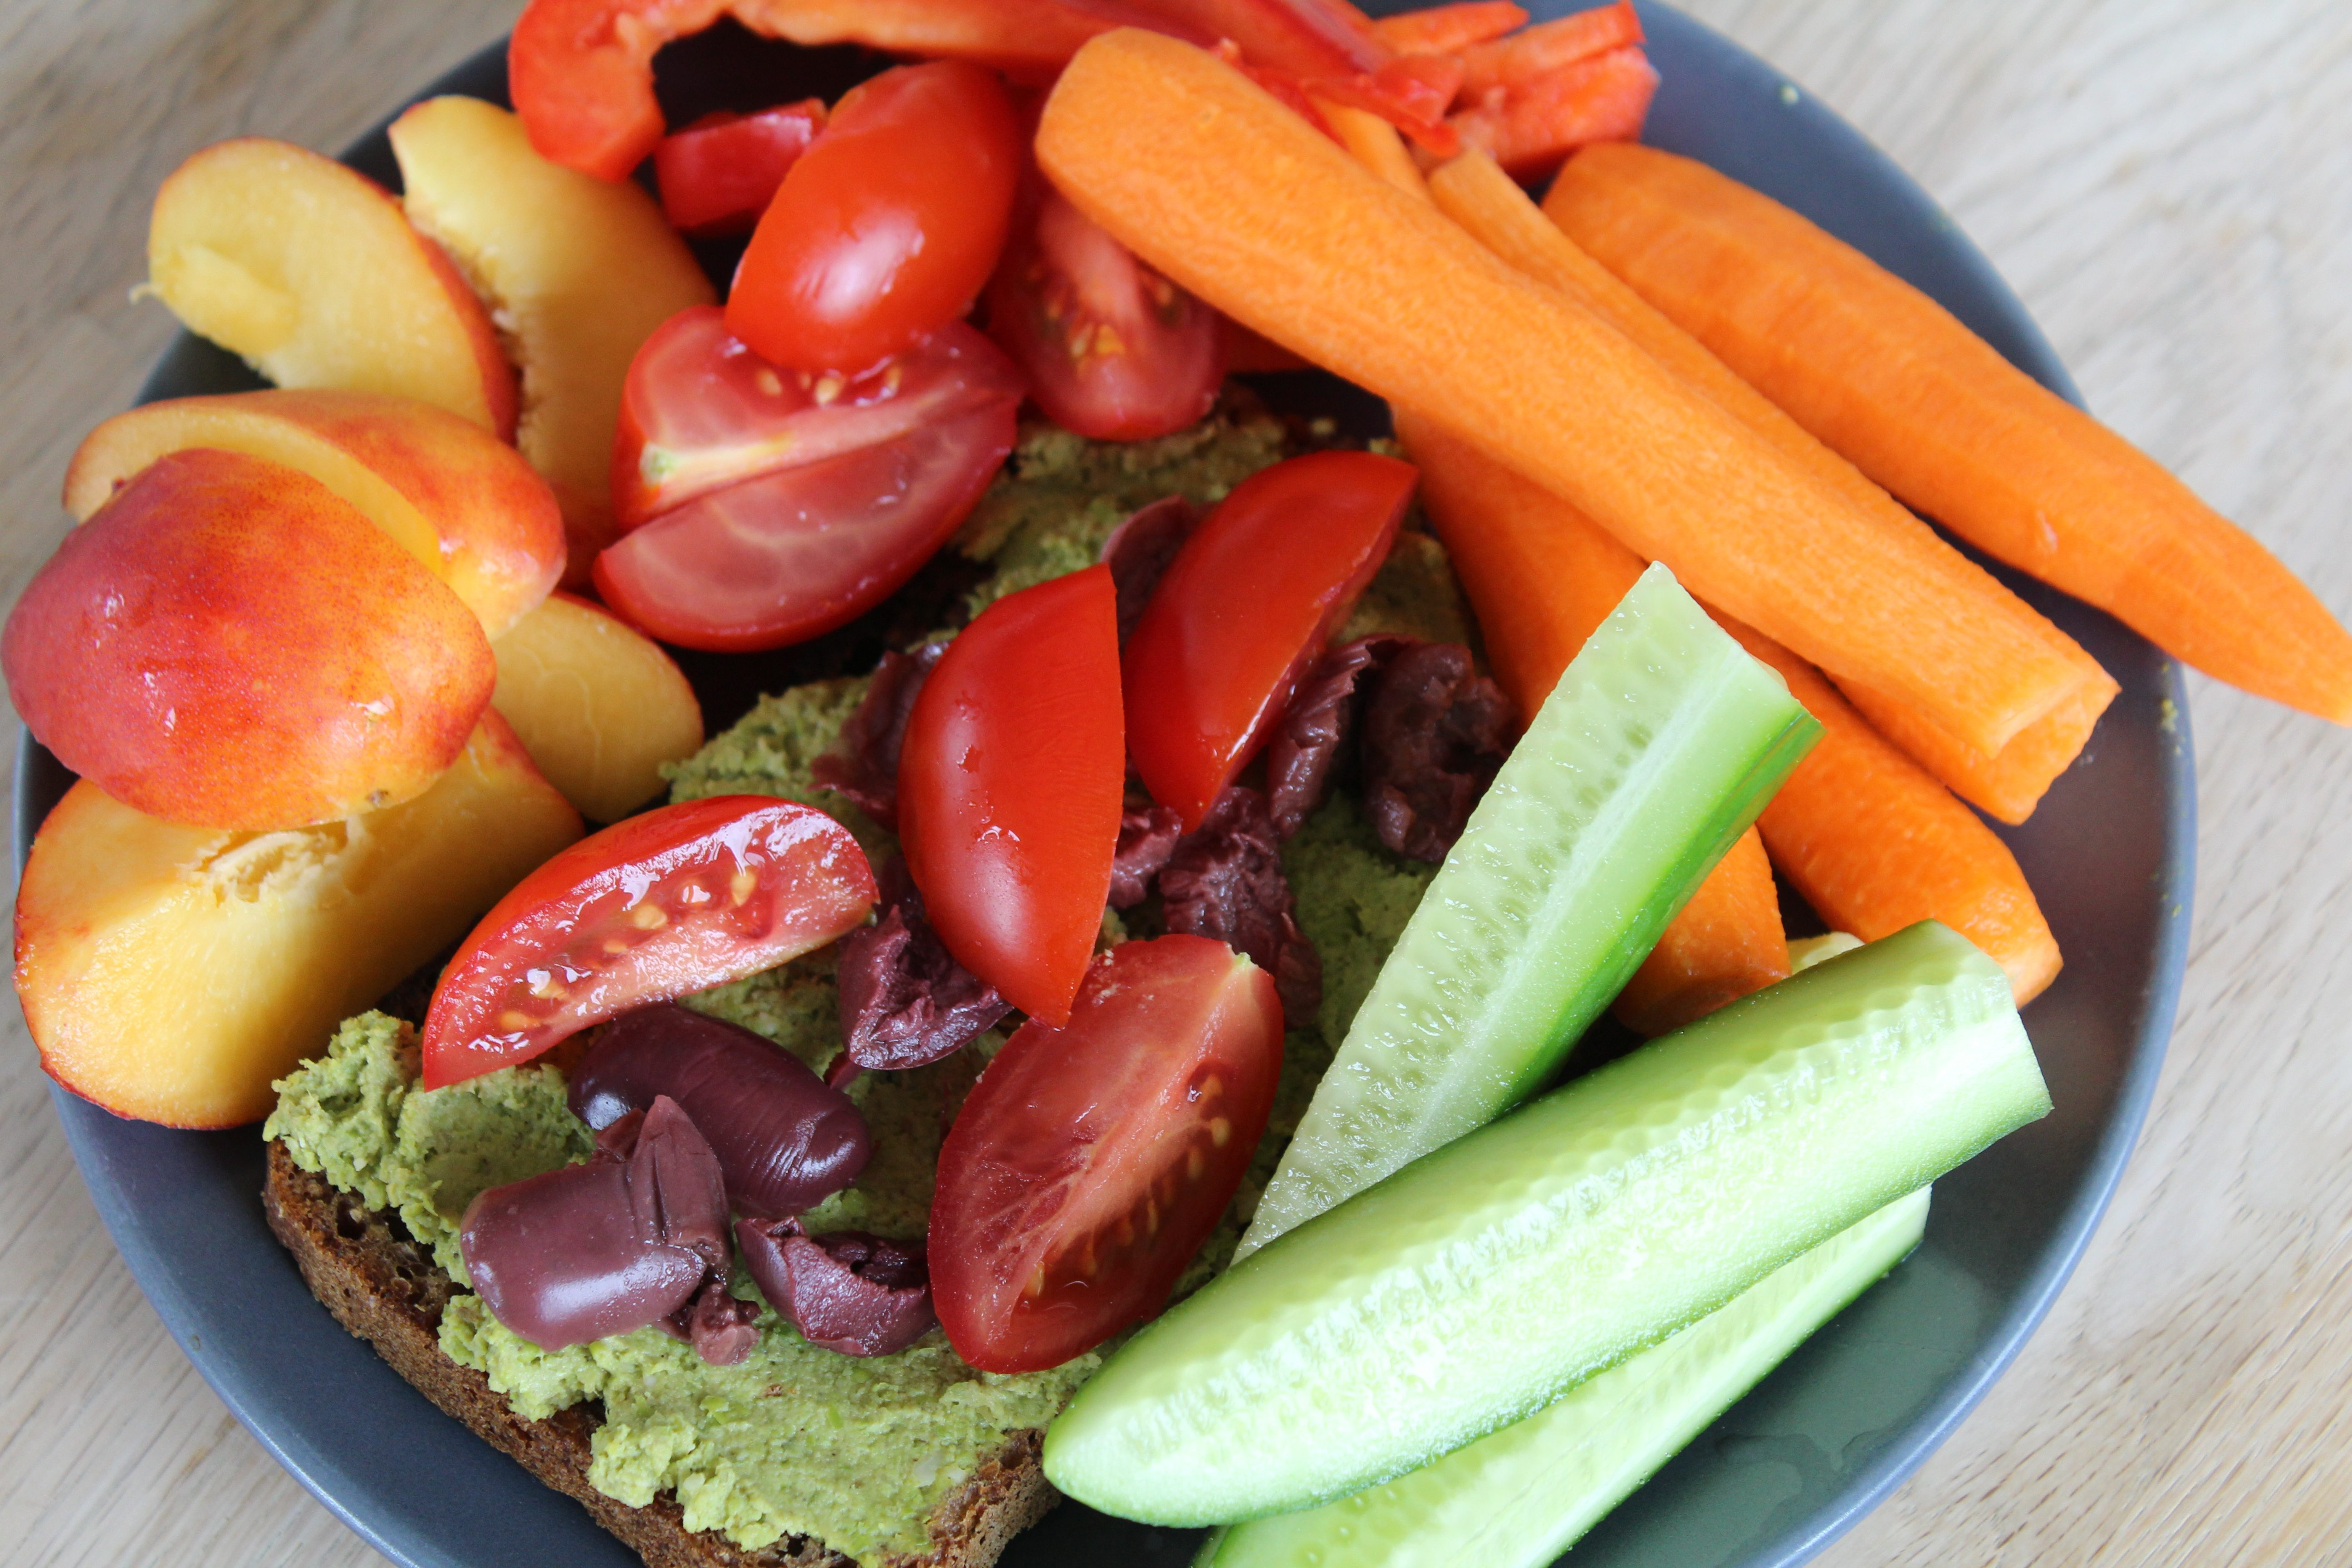 Farverig vegansk frokost